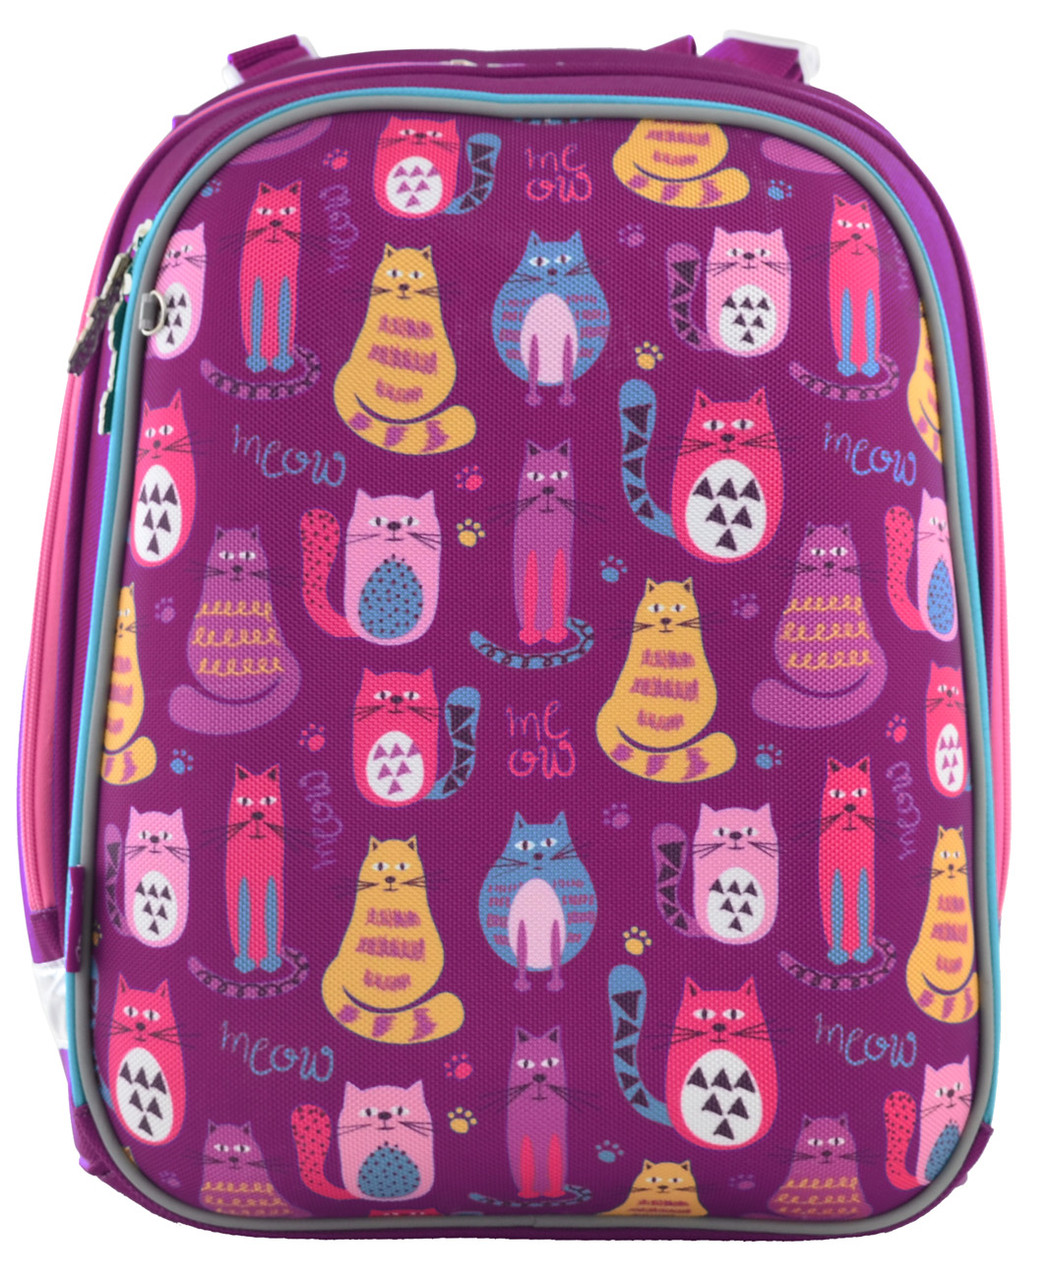 556024 Яркий каркасный рюкзак 1 Вересня H-12 Cute cats  29*38*15